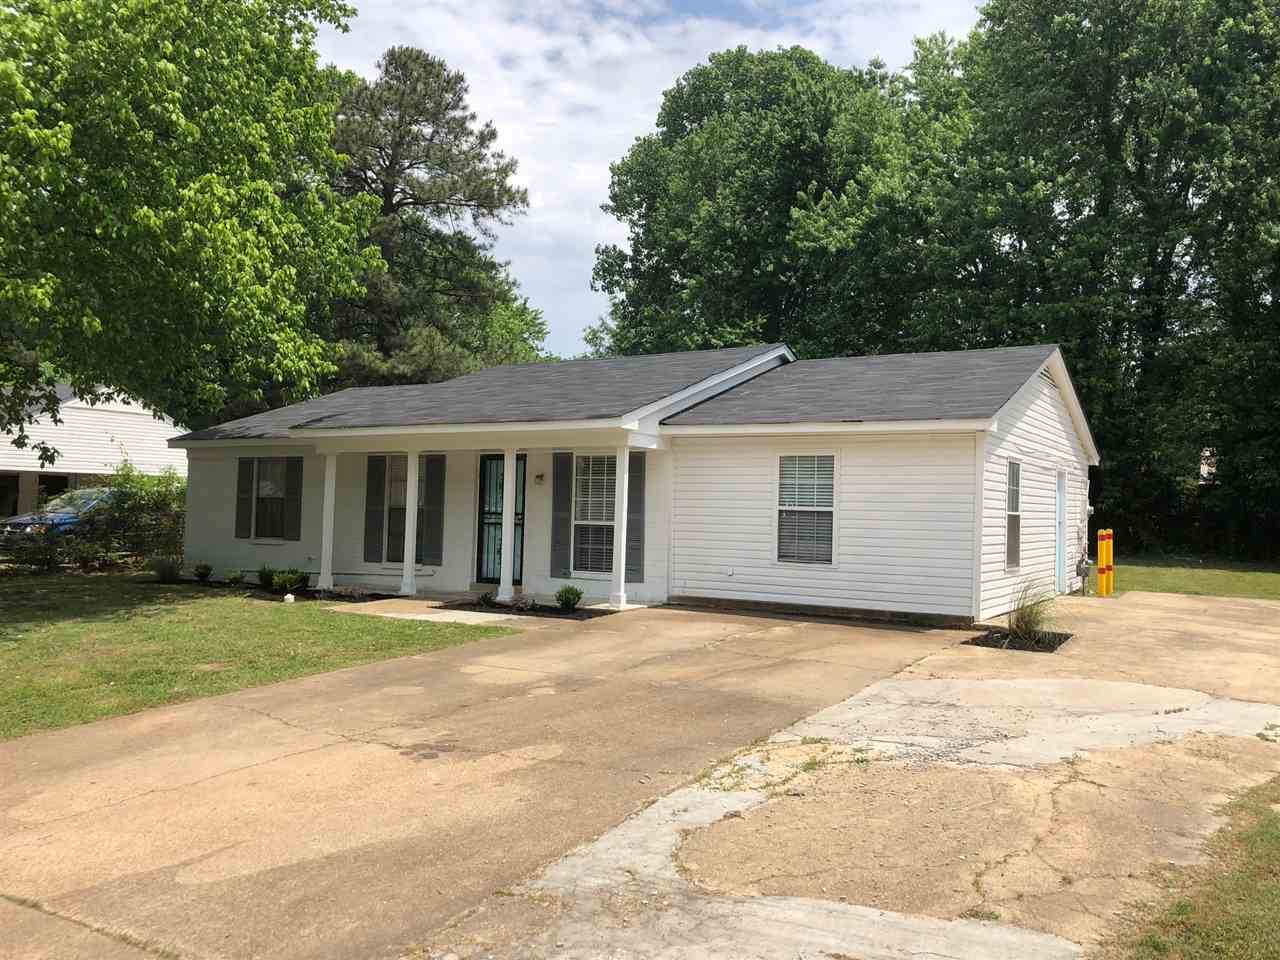 Property for sale at 8186 Leighton Ln, Millington,  TN 38053